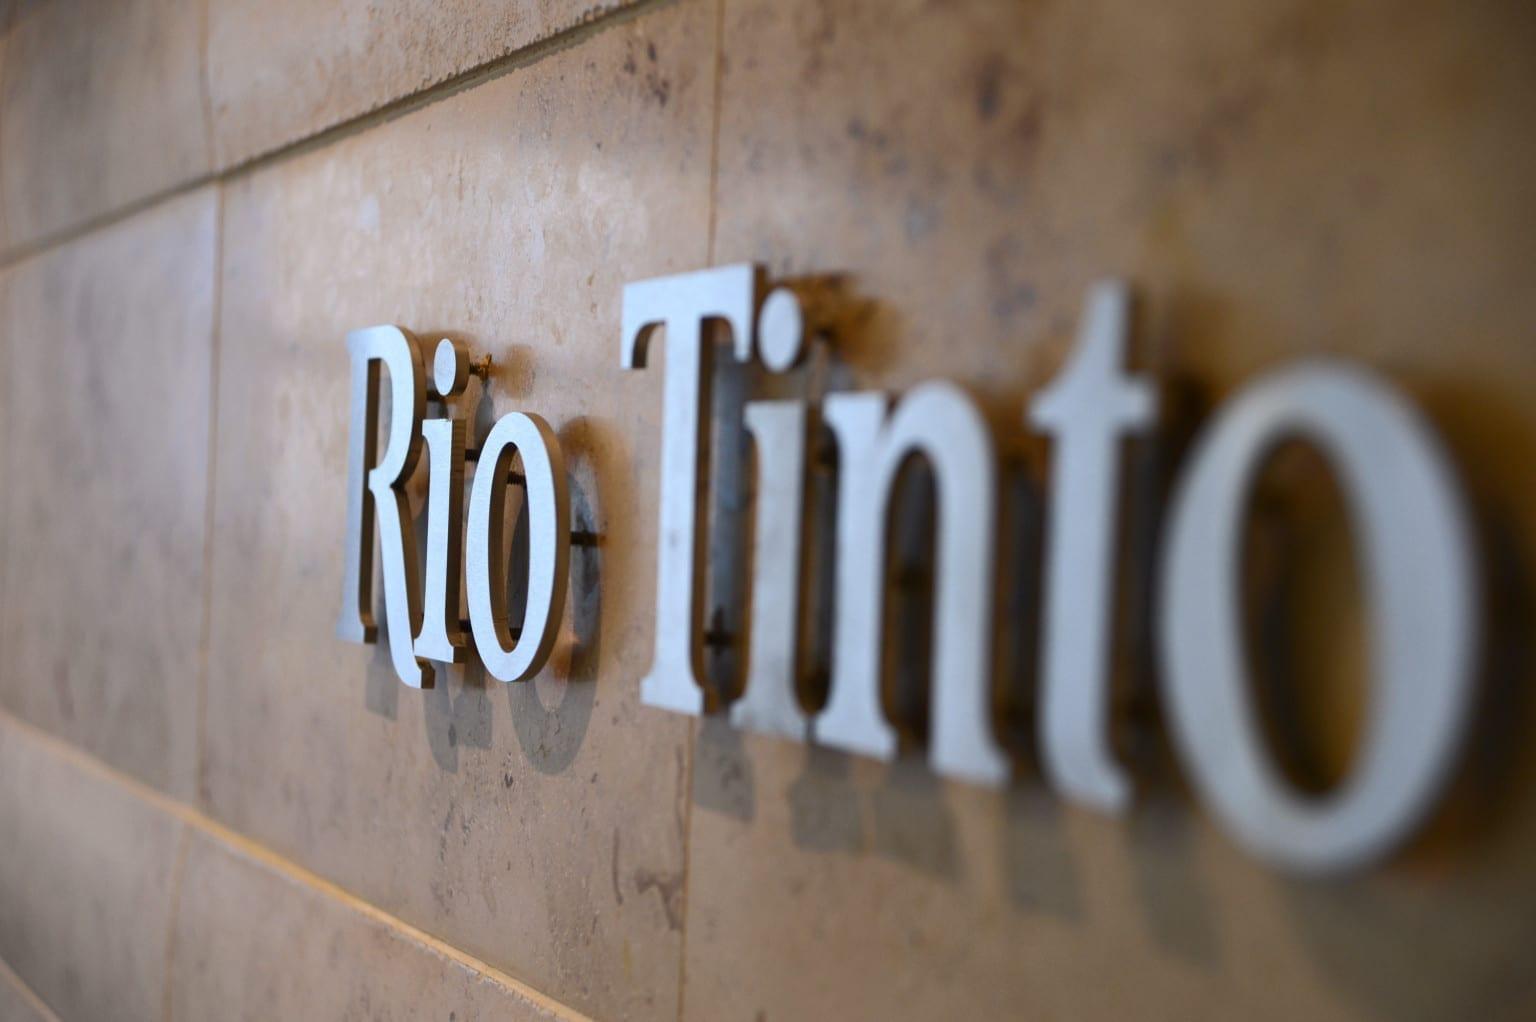 Rio Tinto's productivity drive a $5 billion effort